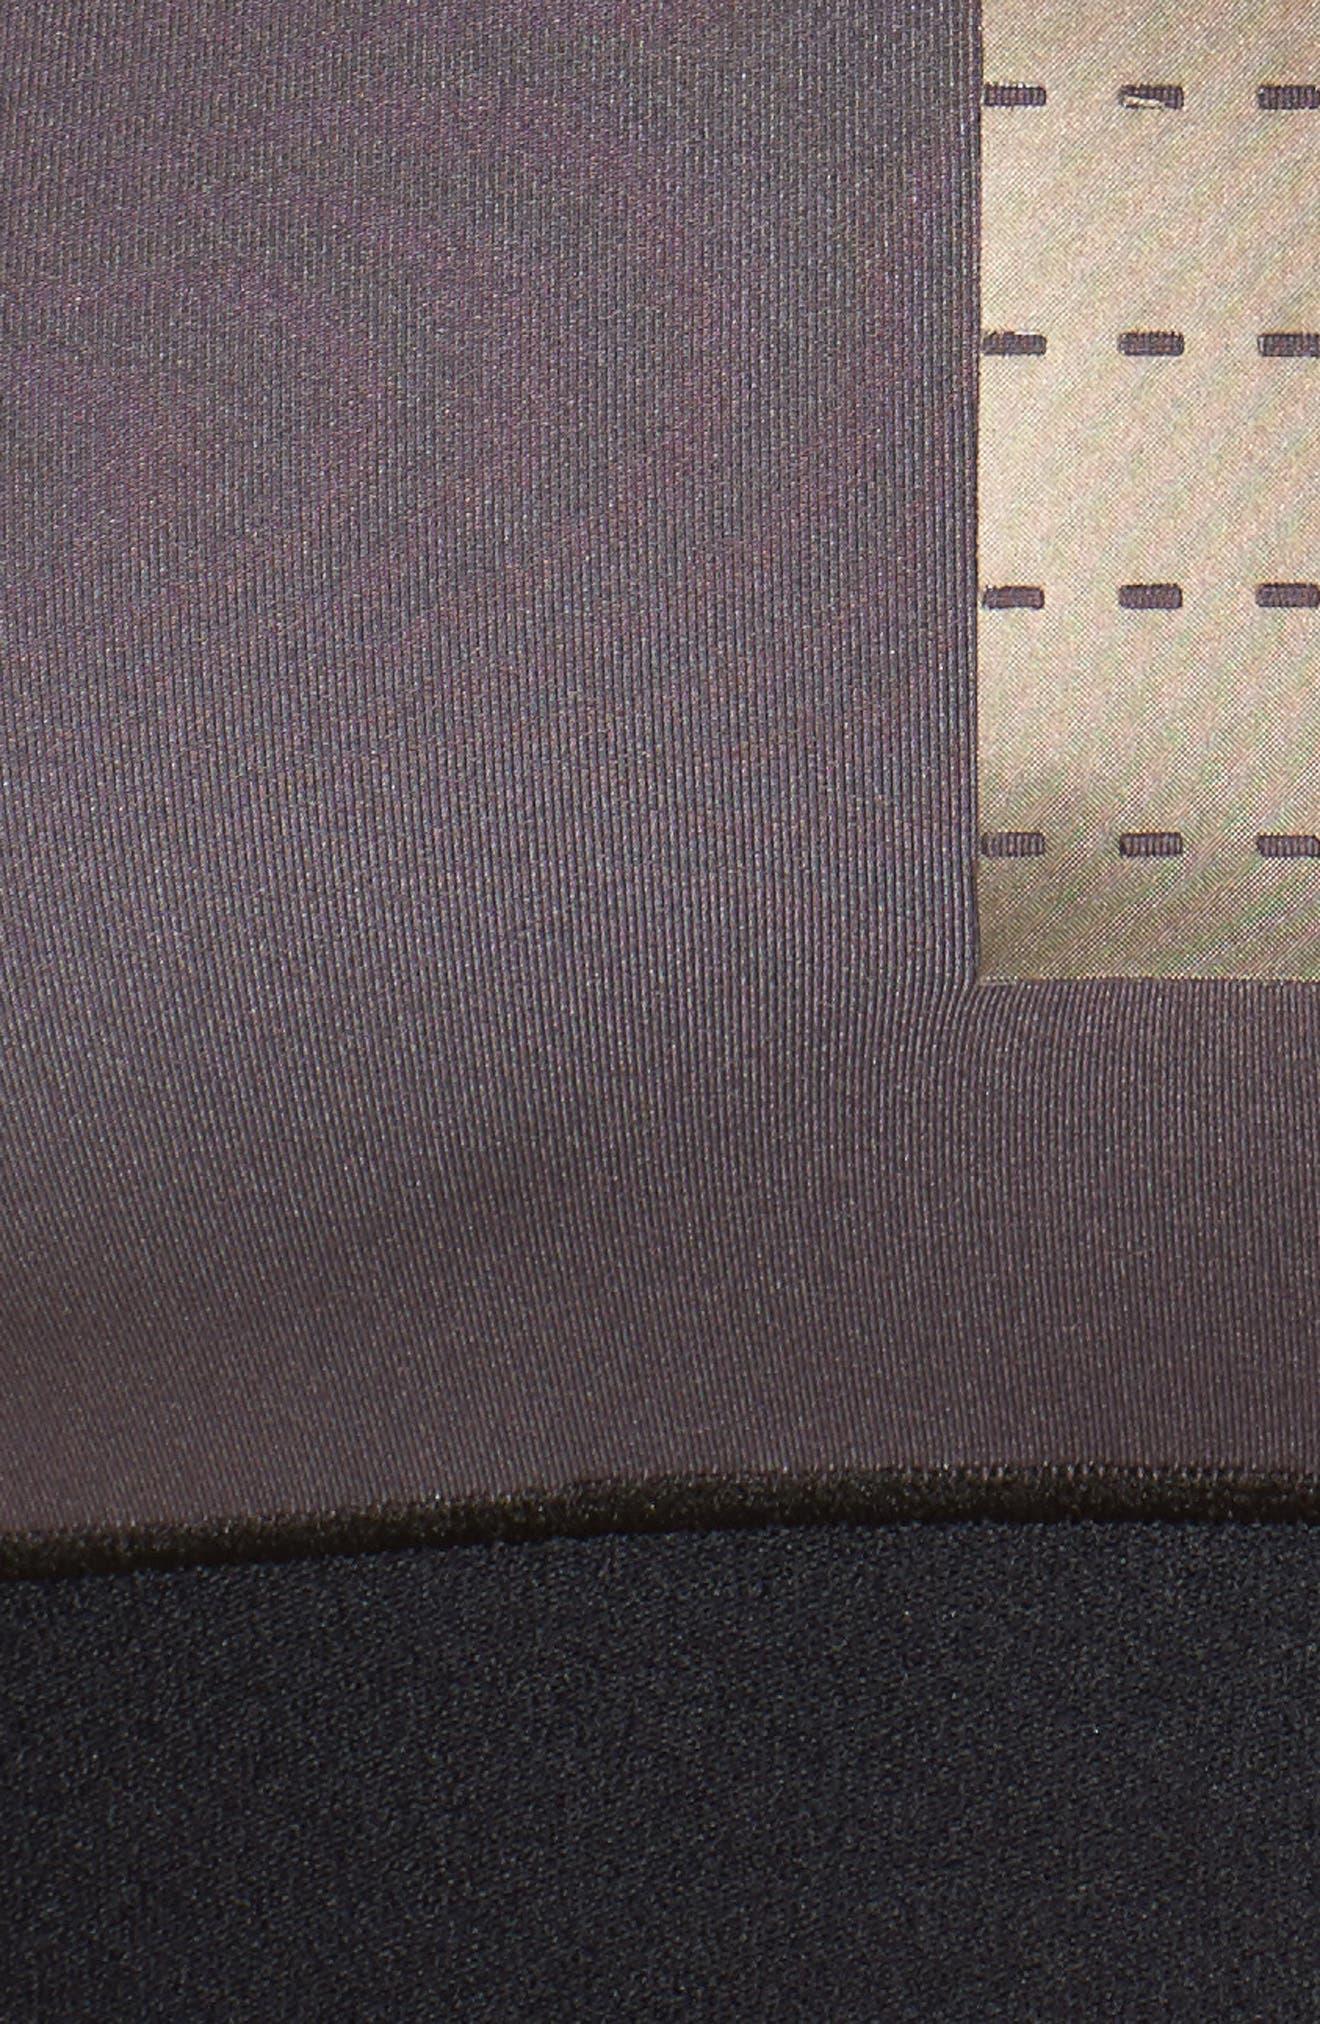 Altitude Silk AK17 Crop Top,                             Alternate thumbnail 6, color,                             285